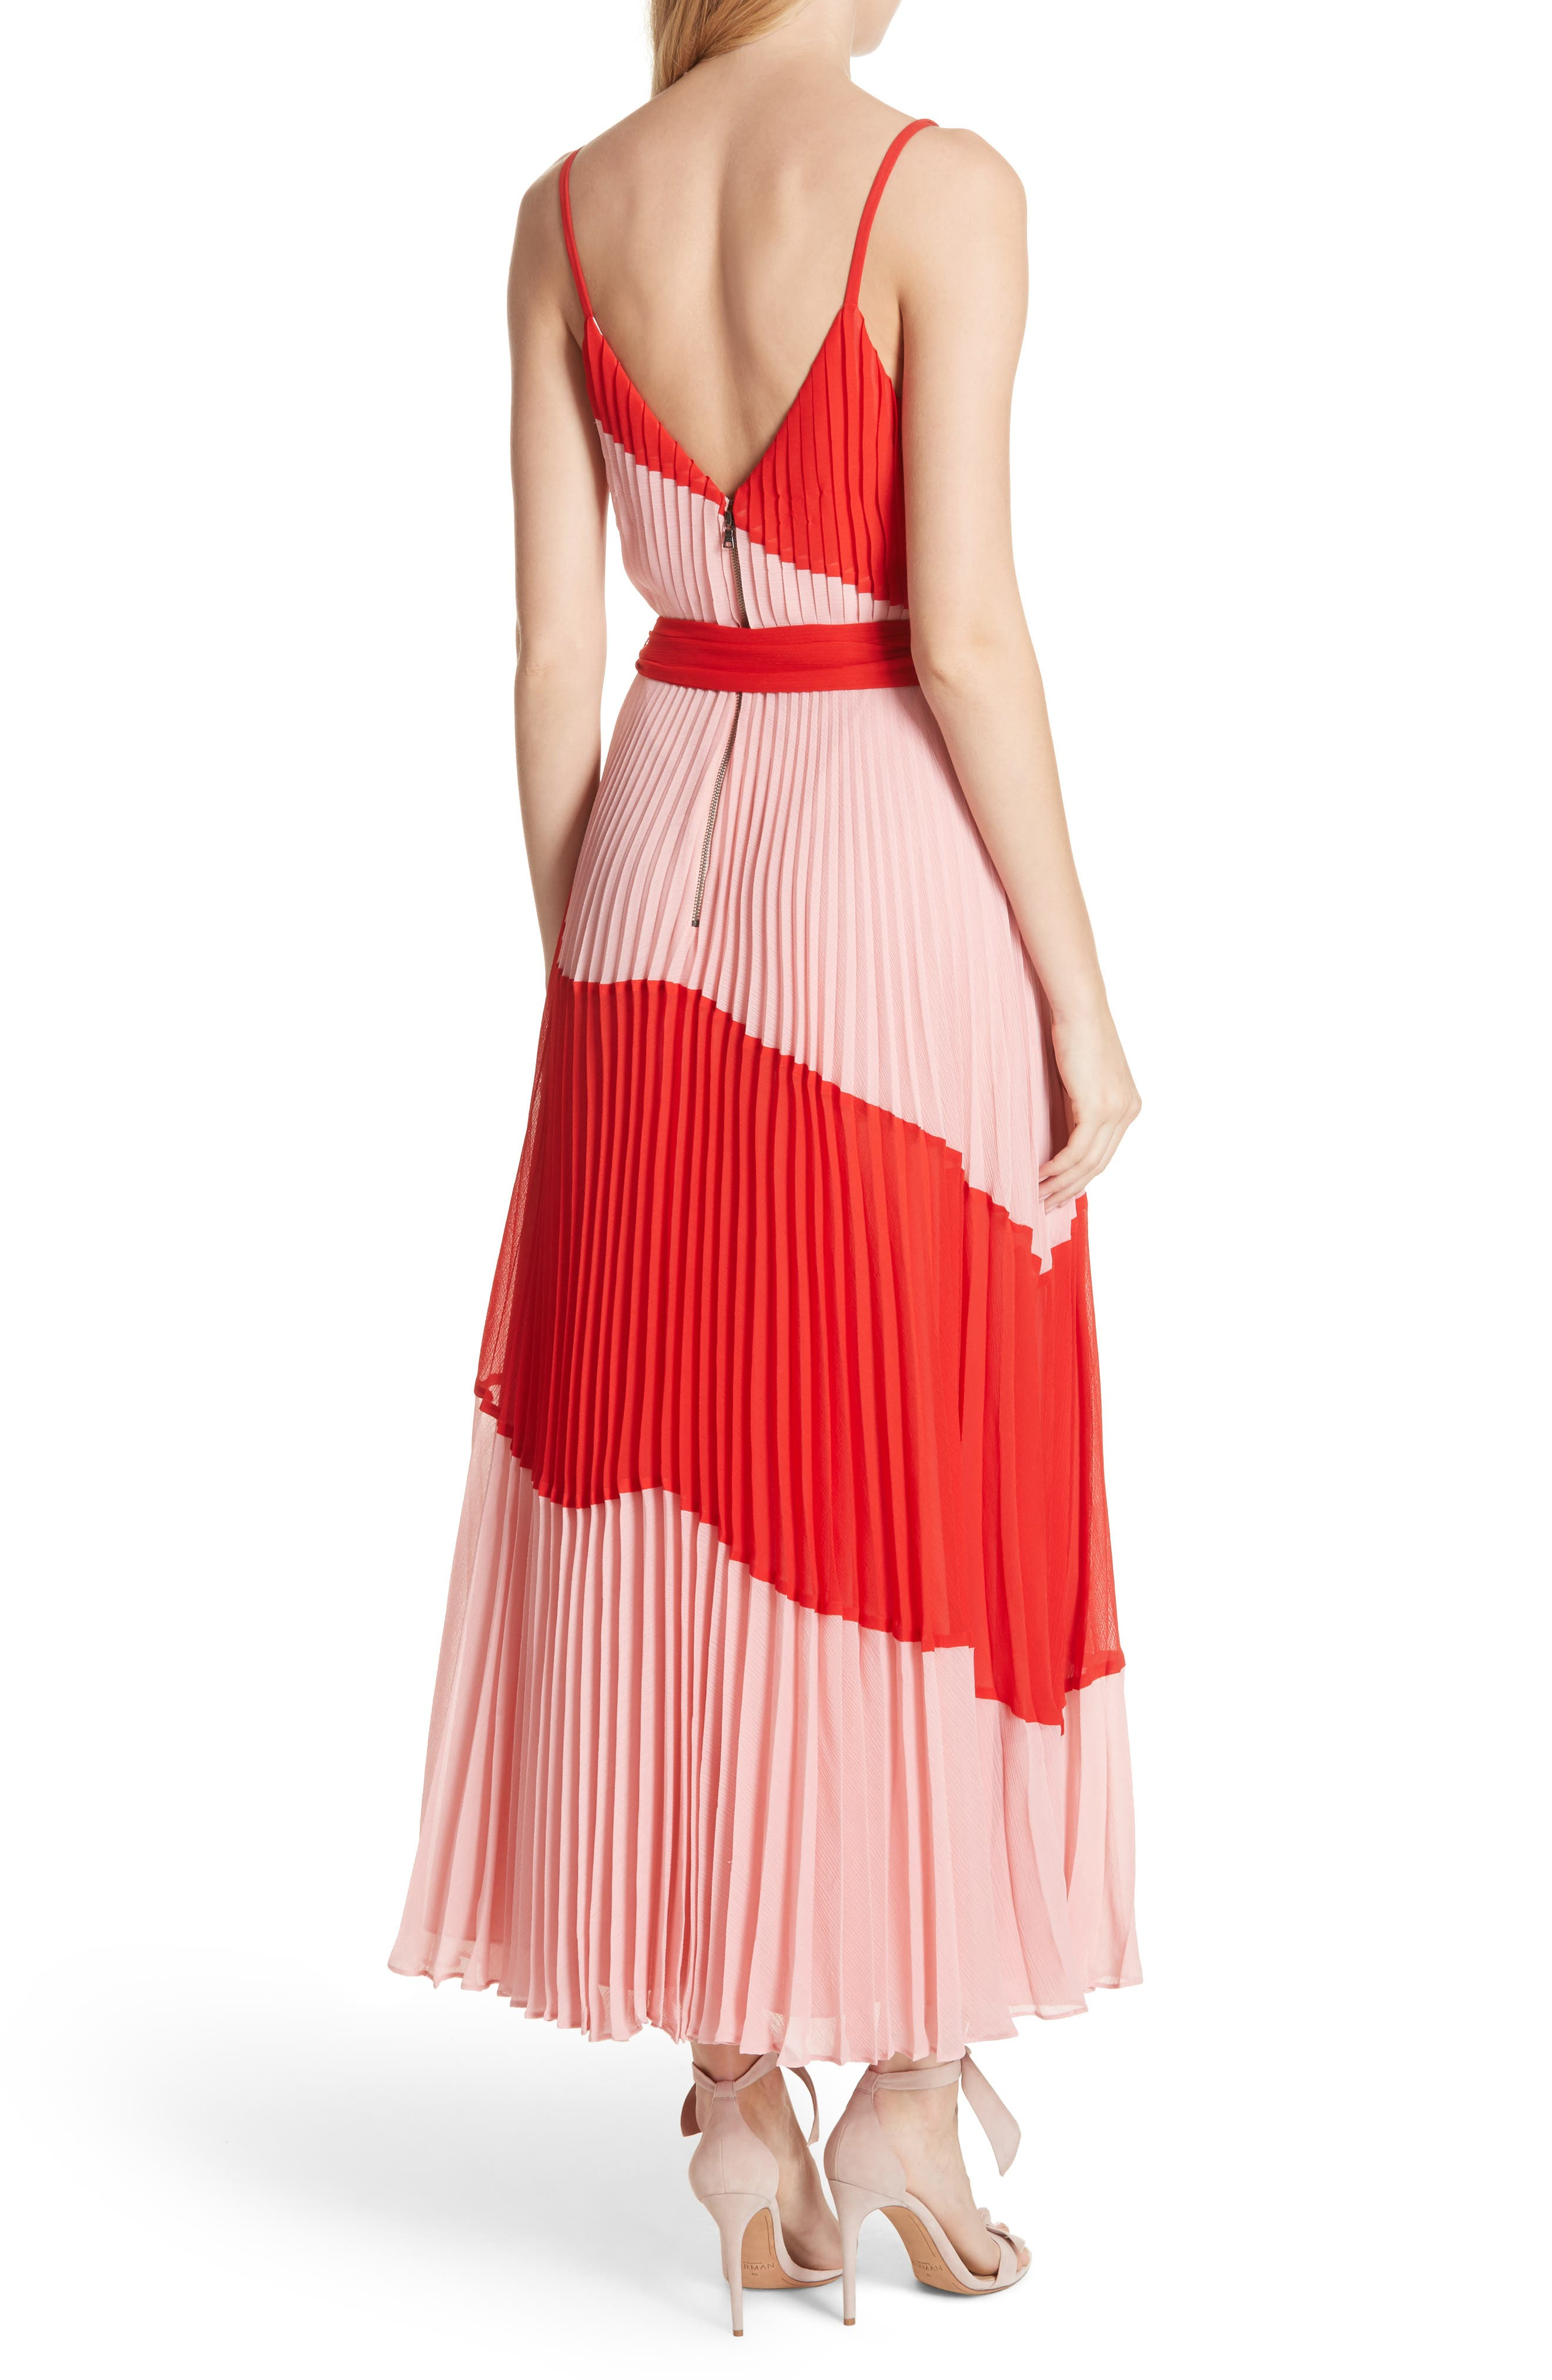 Rozlyn Pleat Colorblock Maxi Dress,                             Alternate thumbnail 2, color,                             Perfect Poppy/ Blossom